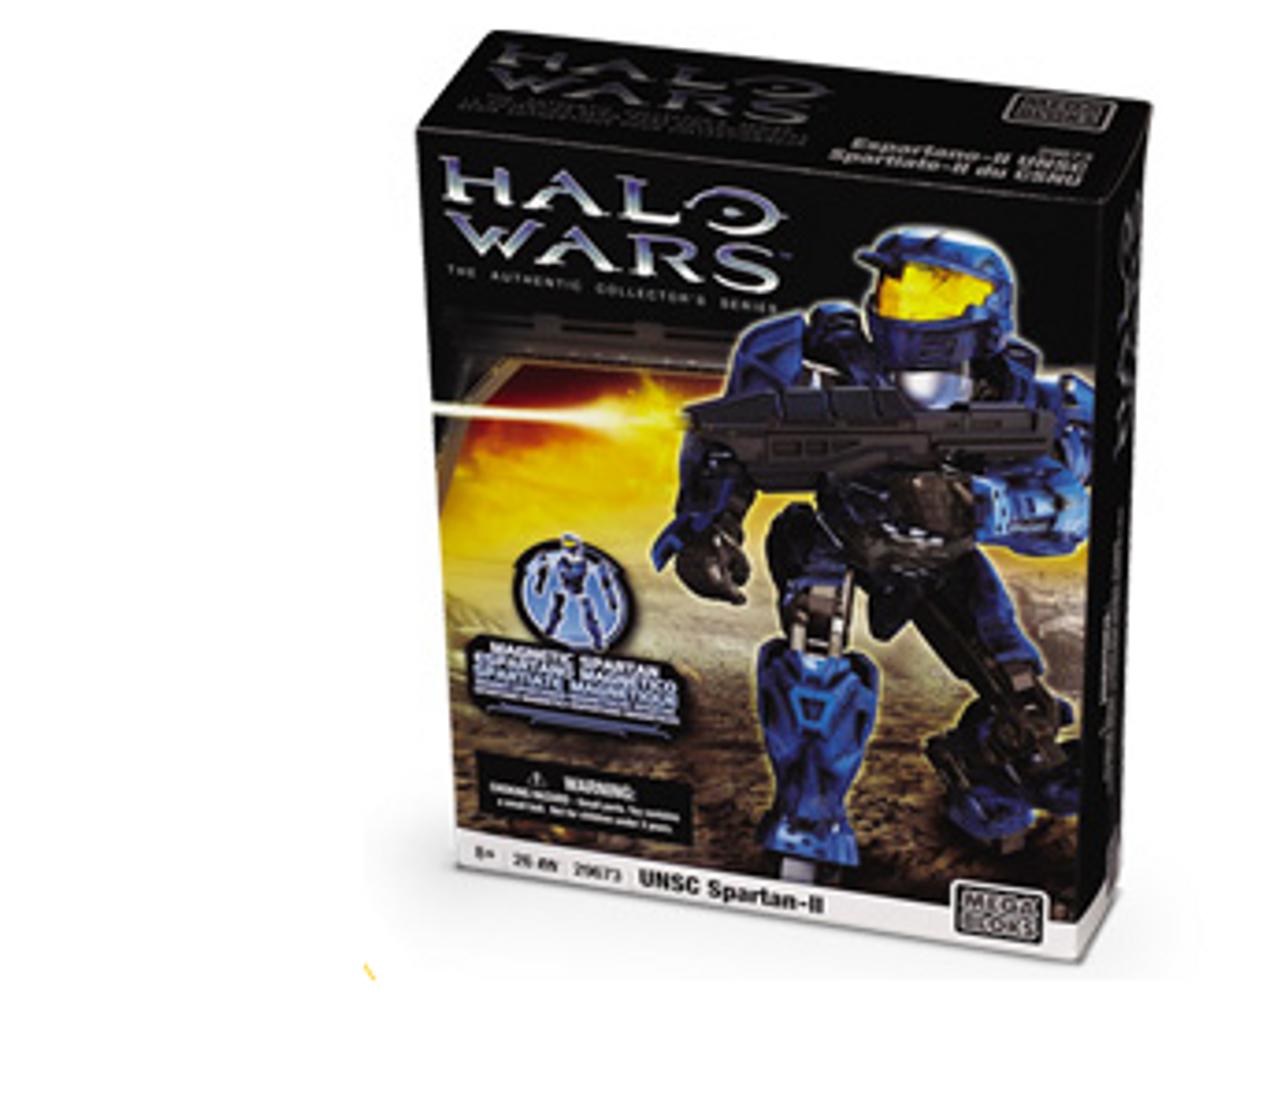 Mega Bloks Halo Magnetic Figures UNSC Spartan-II Set #29673 [Blue]